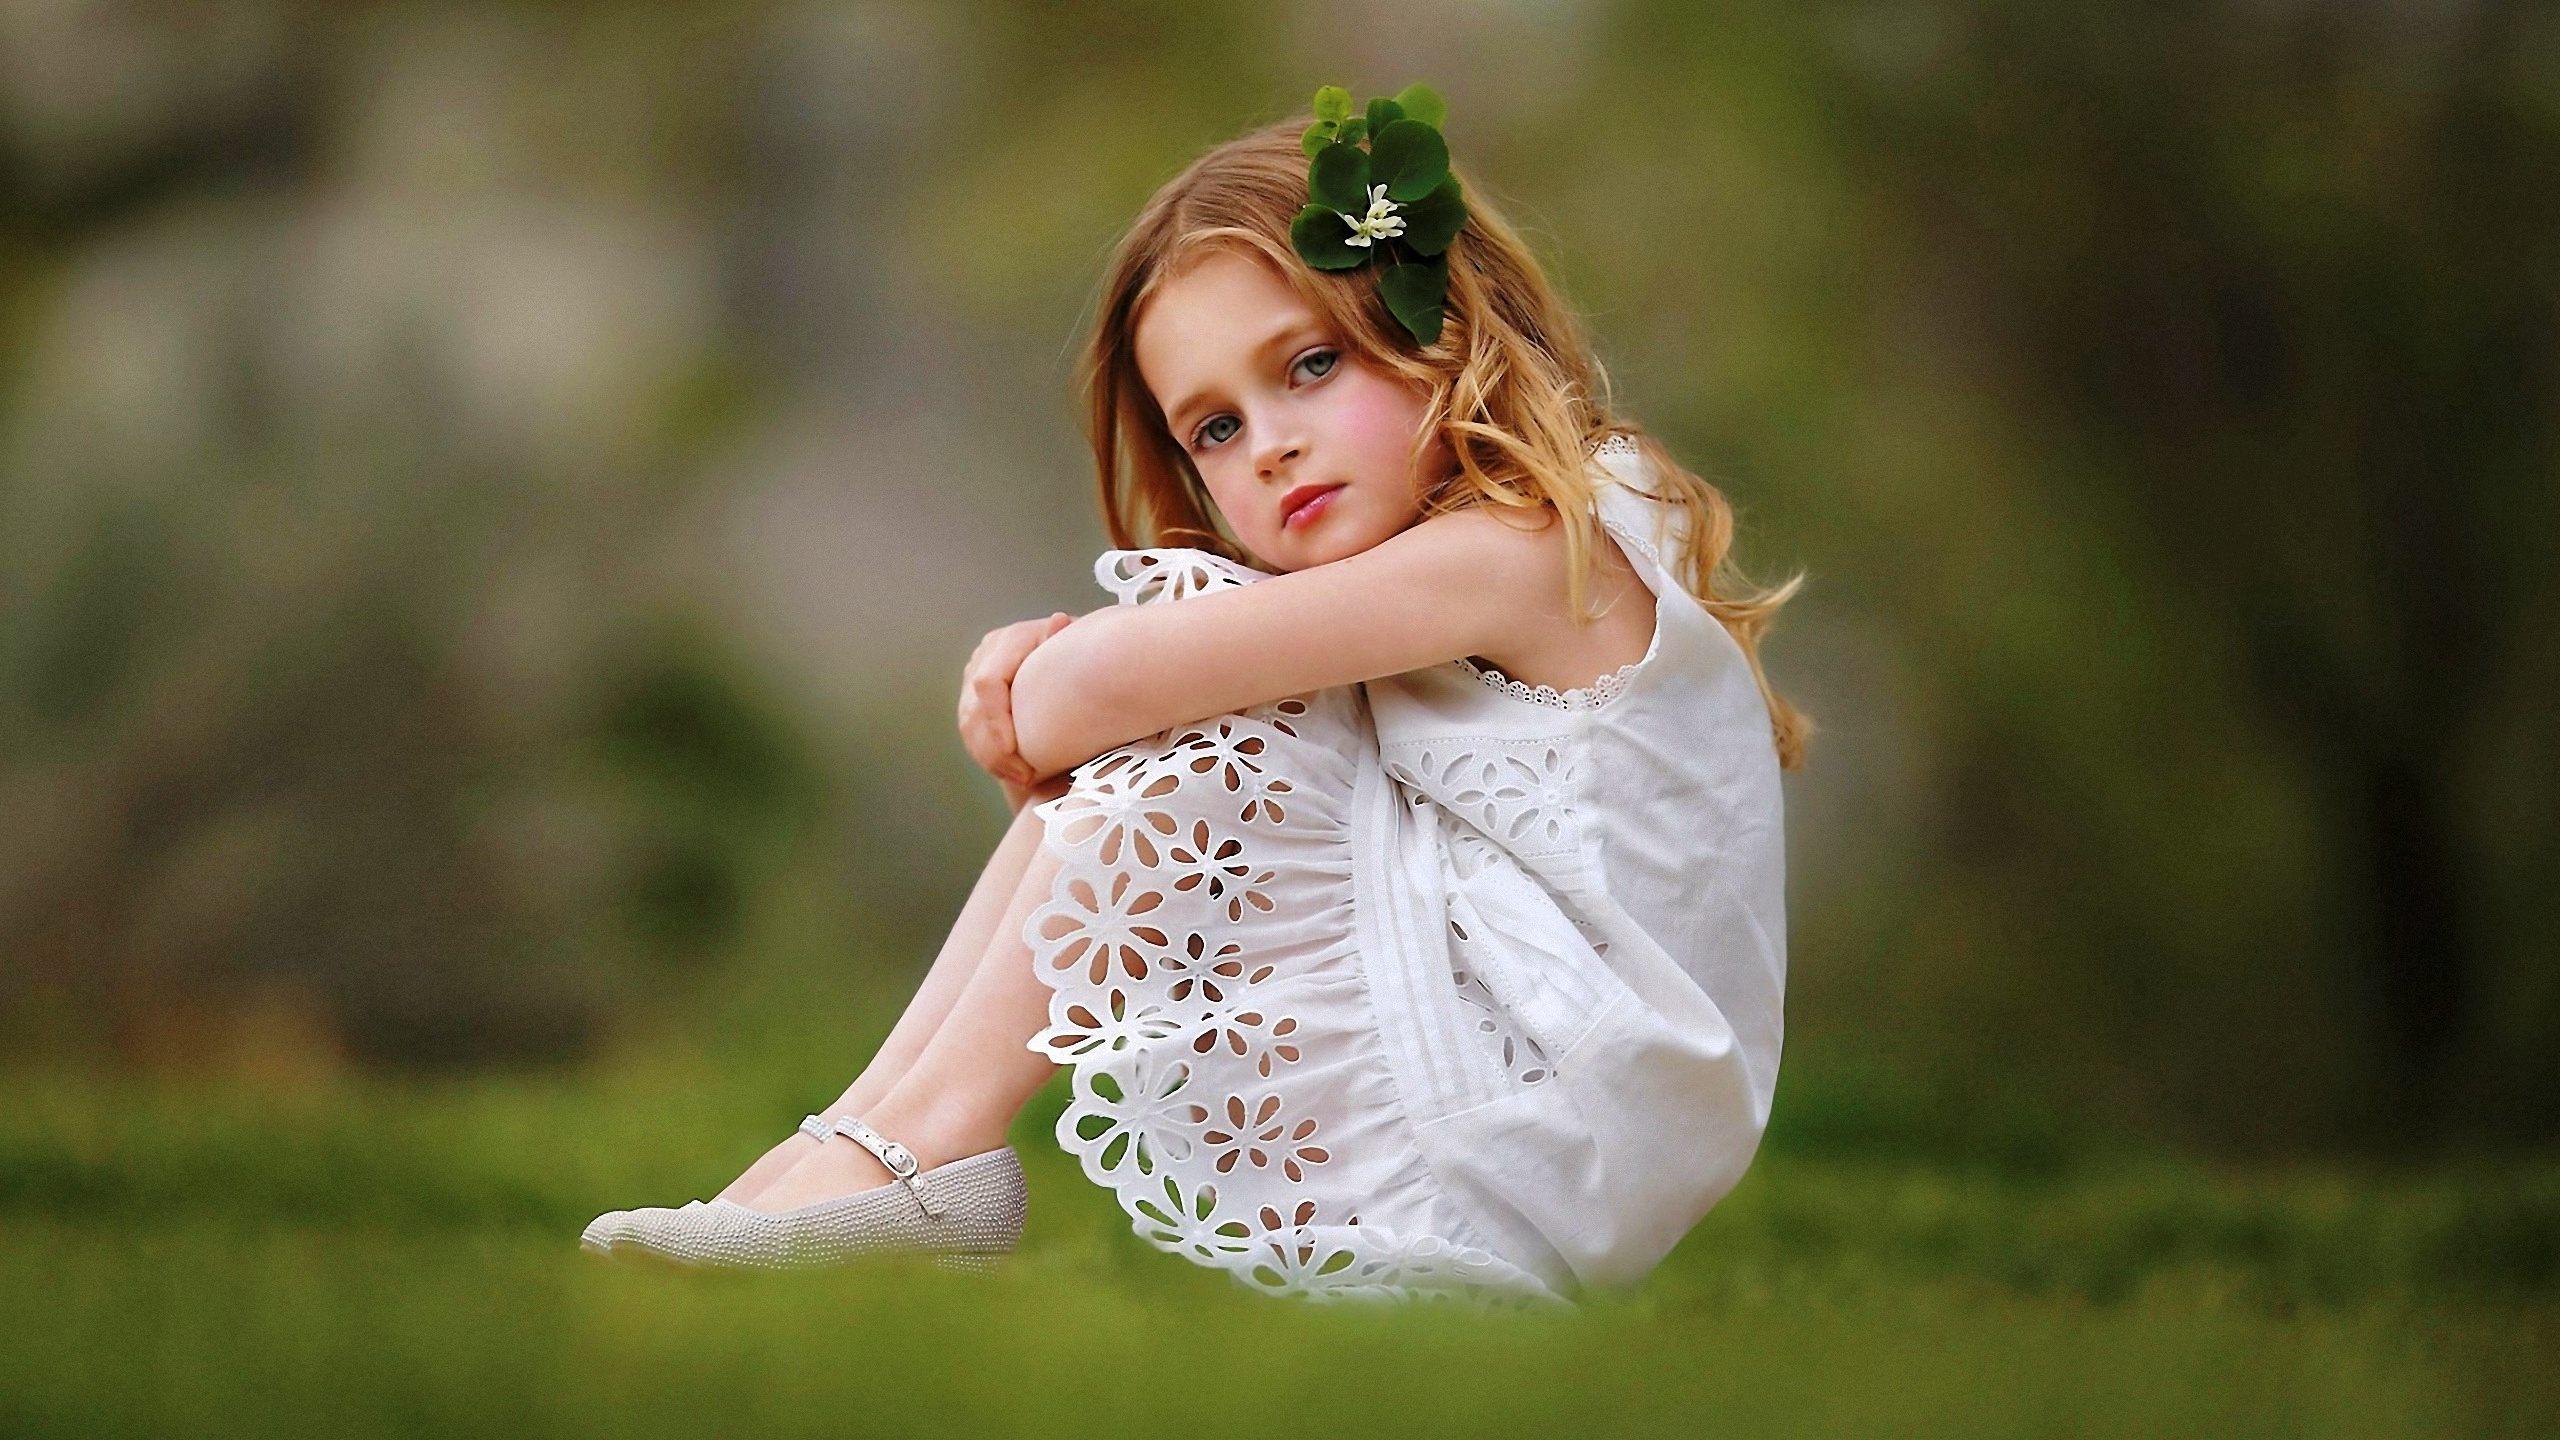 Cute Baby Girl Wallpaper HD Download For Desktop & Mobile